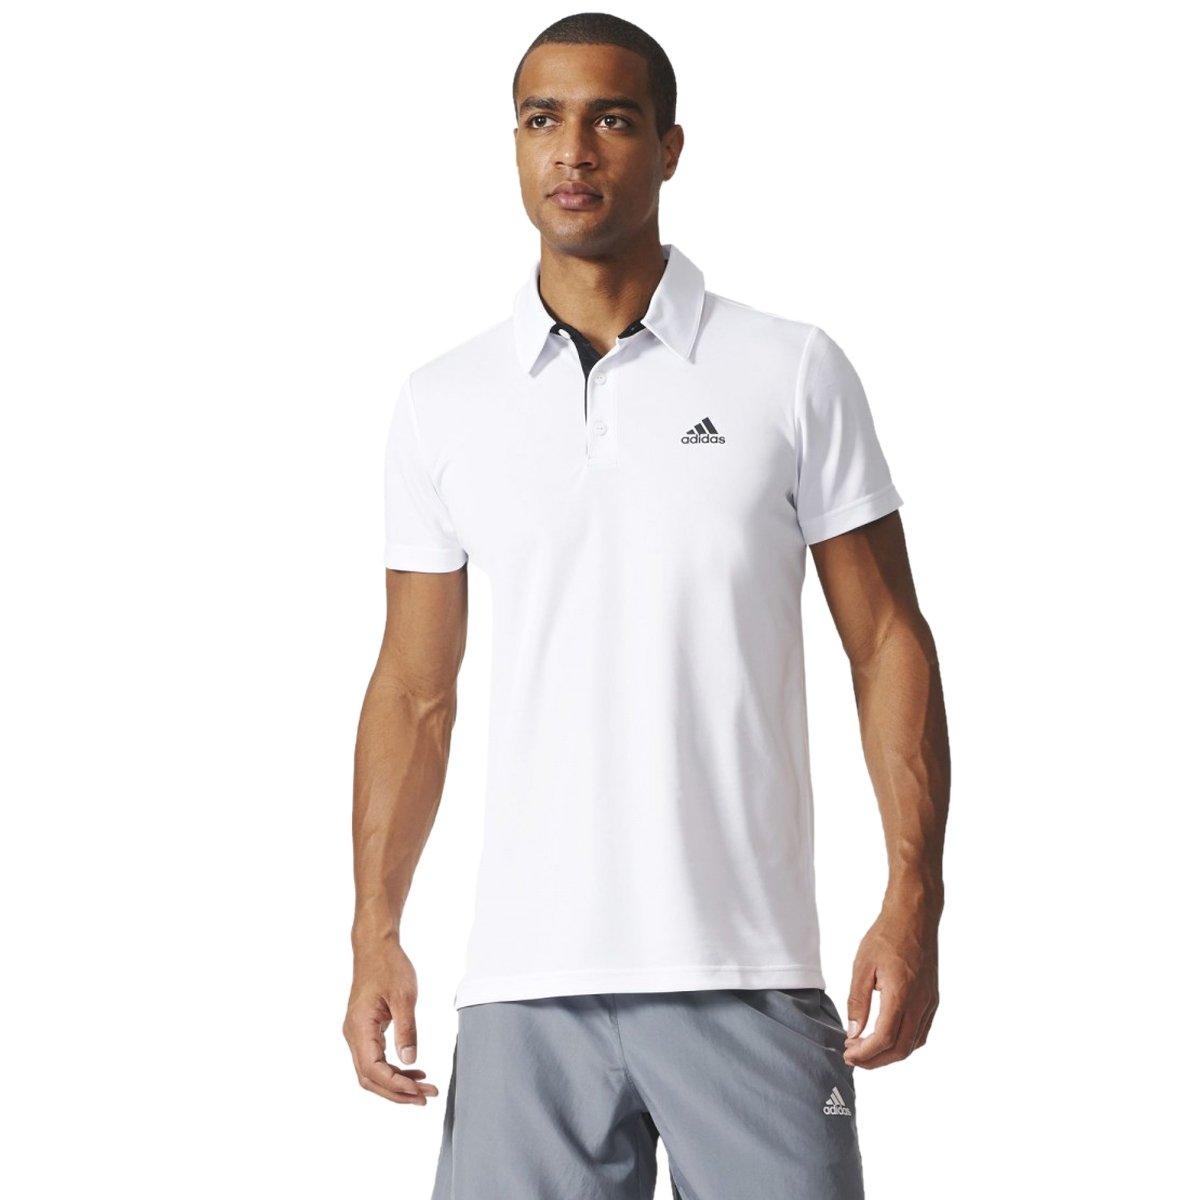 Bizz Store - Camisa Polo Masculina Adidas Fab Tennis Branca c002b75f8aac7